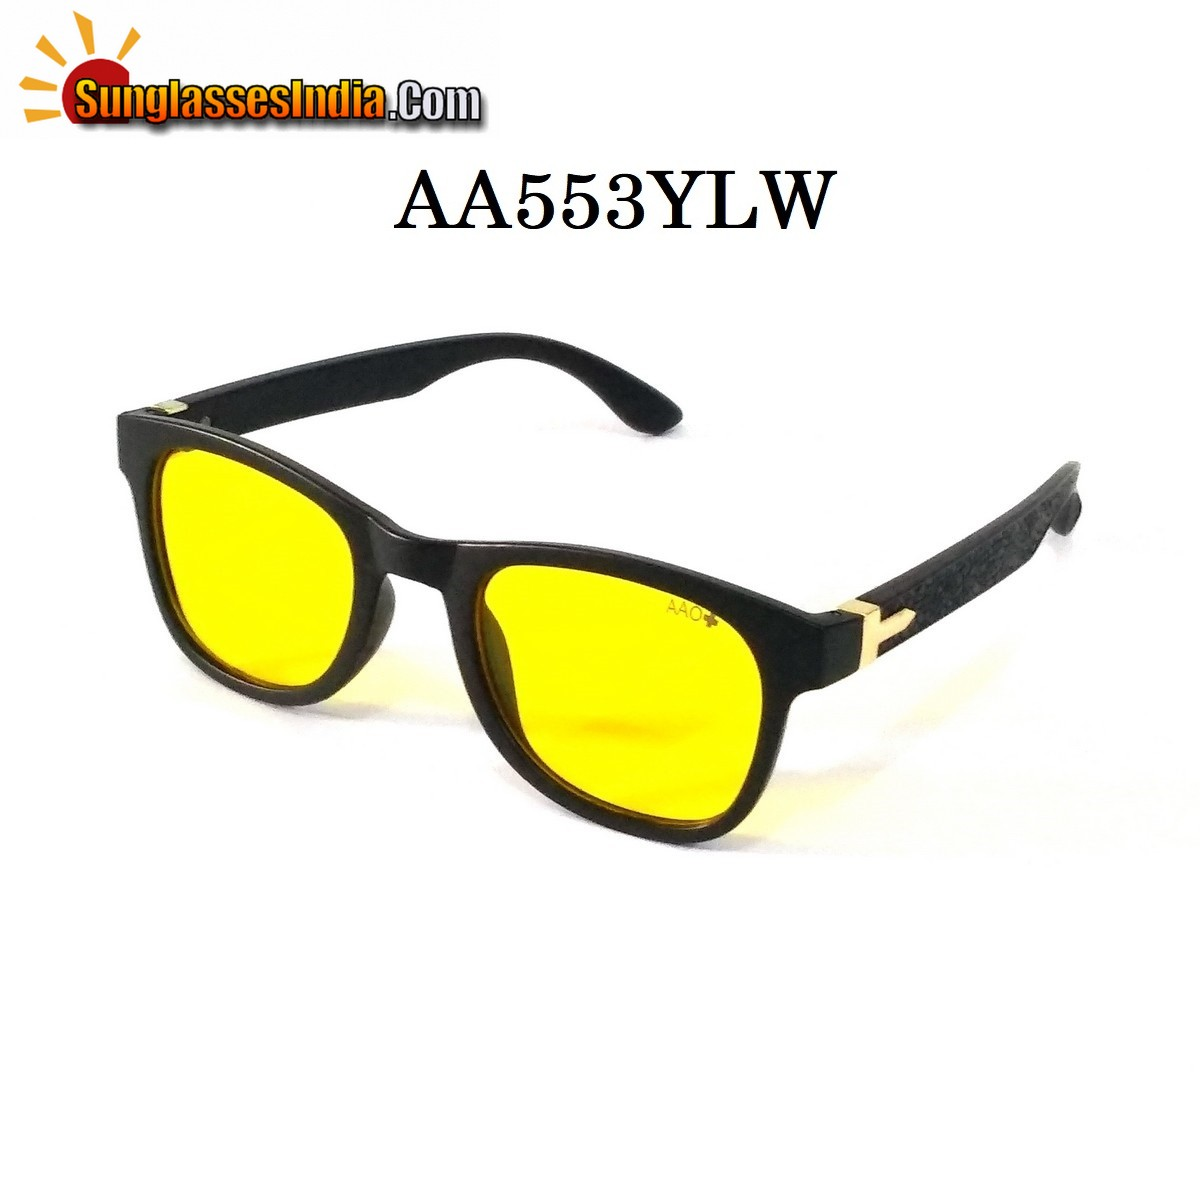 HD Vision Night Driving Wayfare Sunglasses AA553